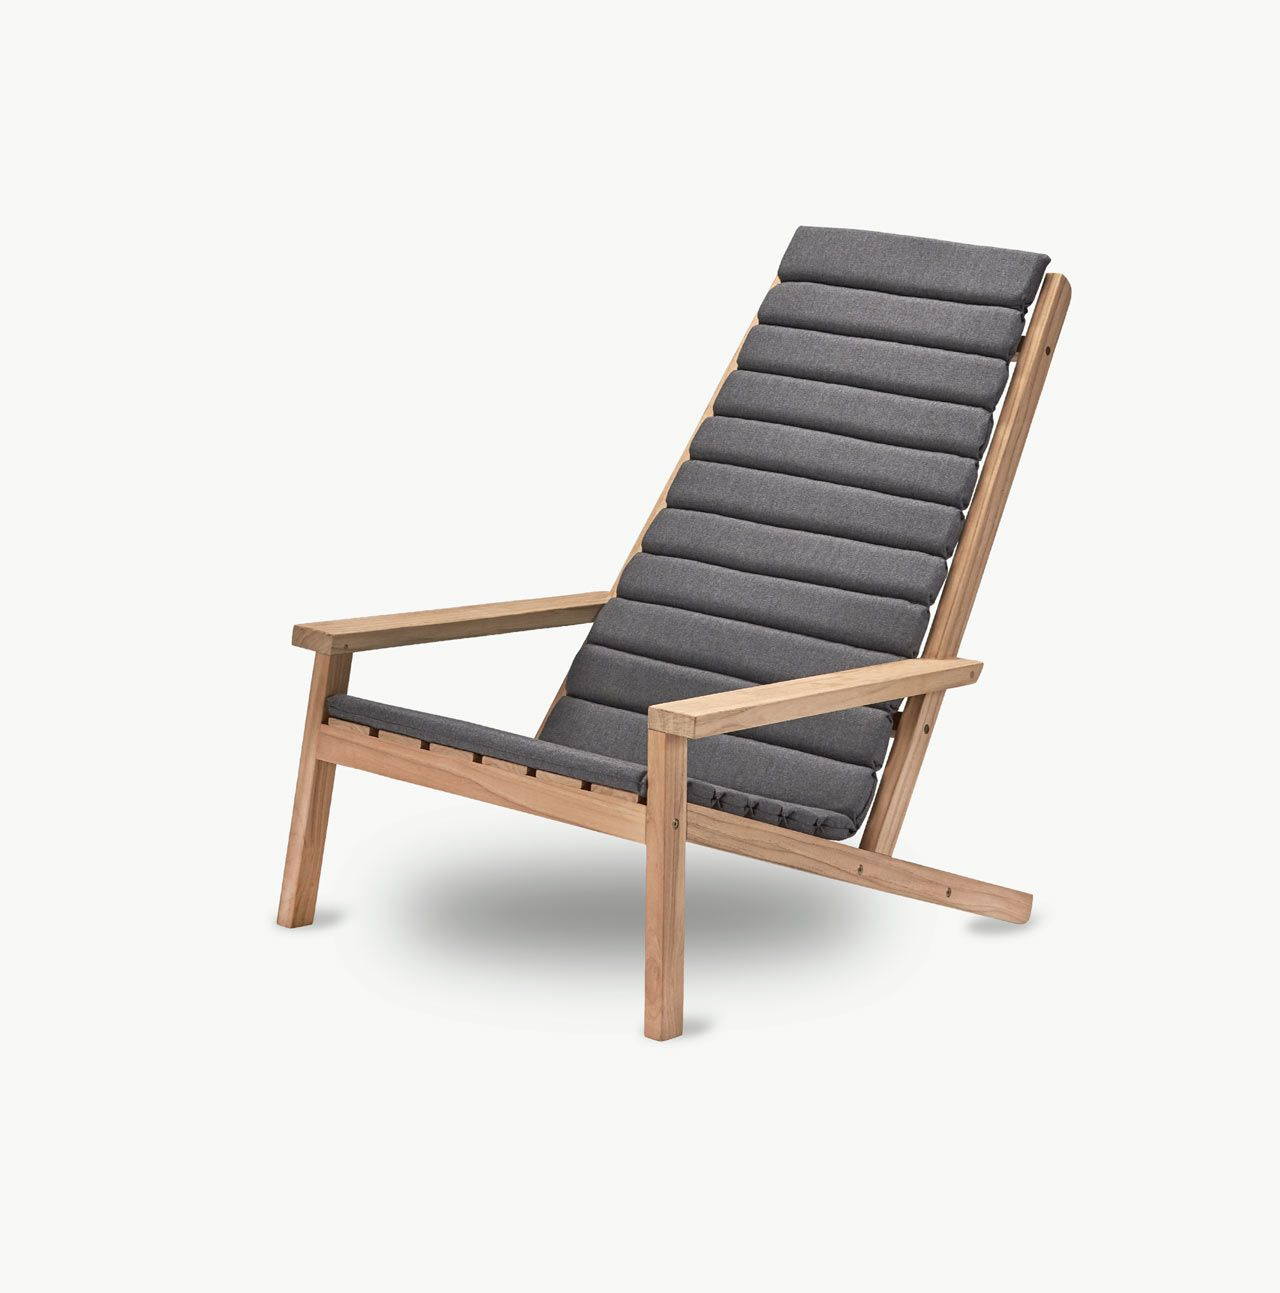 New Wooden Outdoor Furniture From Skagerak